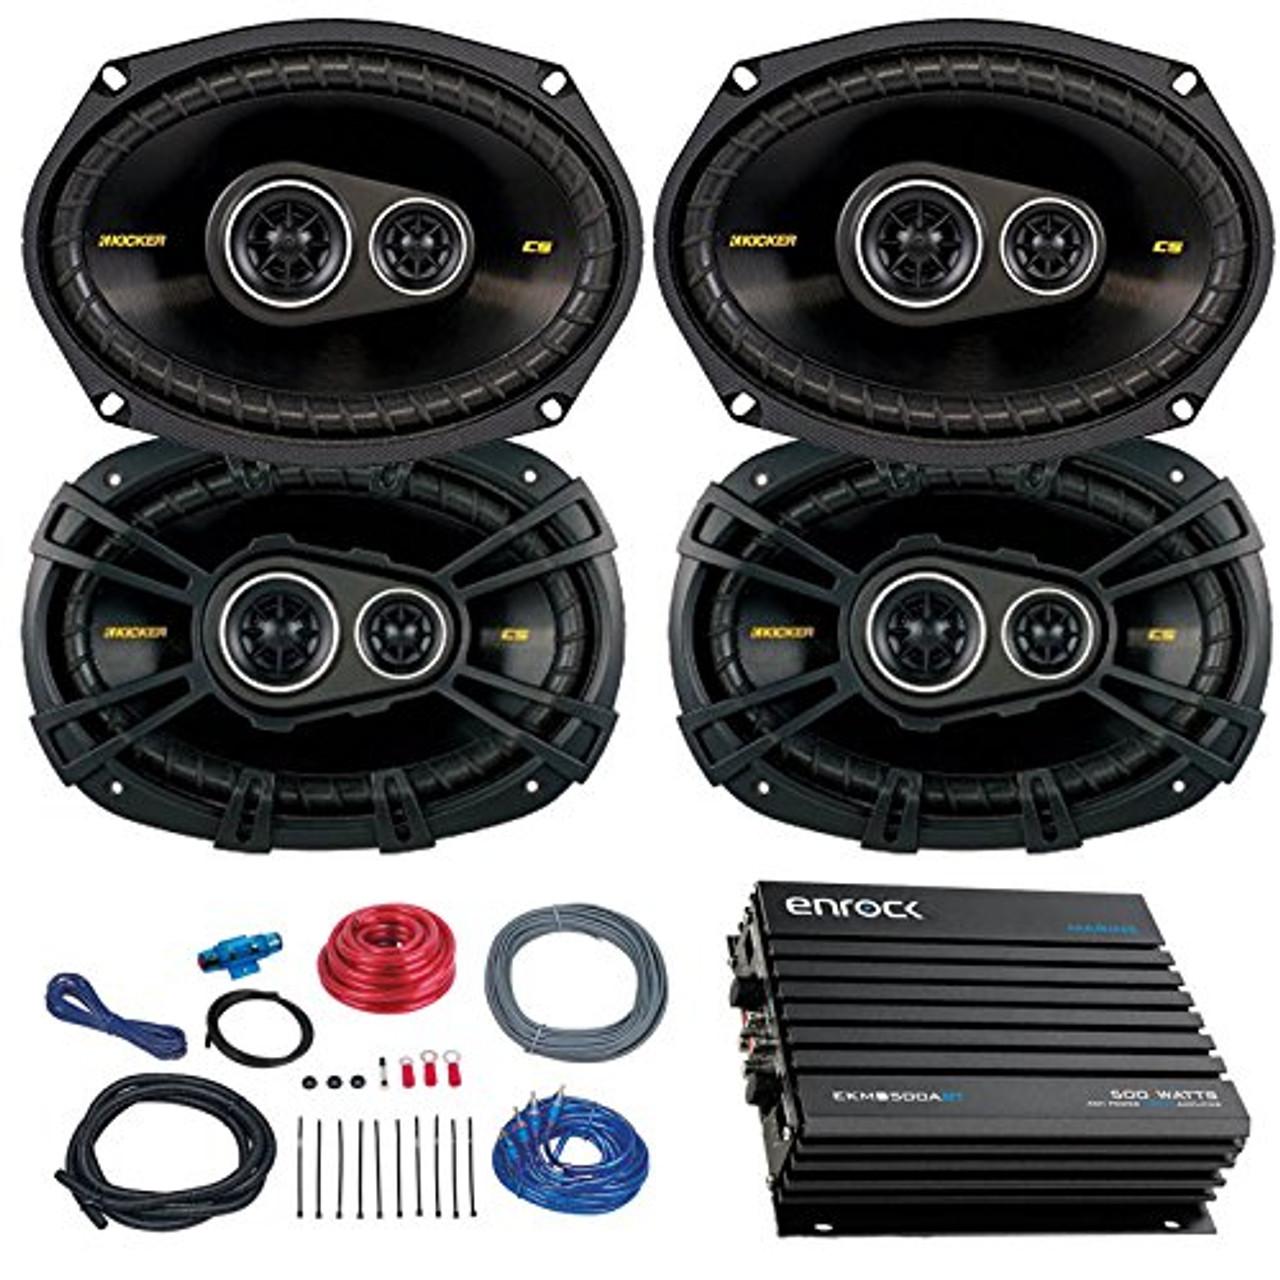 hight resolution of car speaker set with amplifier 4 kicker cs6934 6x9 inch 900 watt 4 ohm